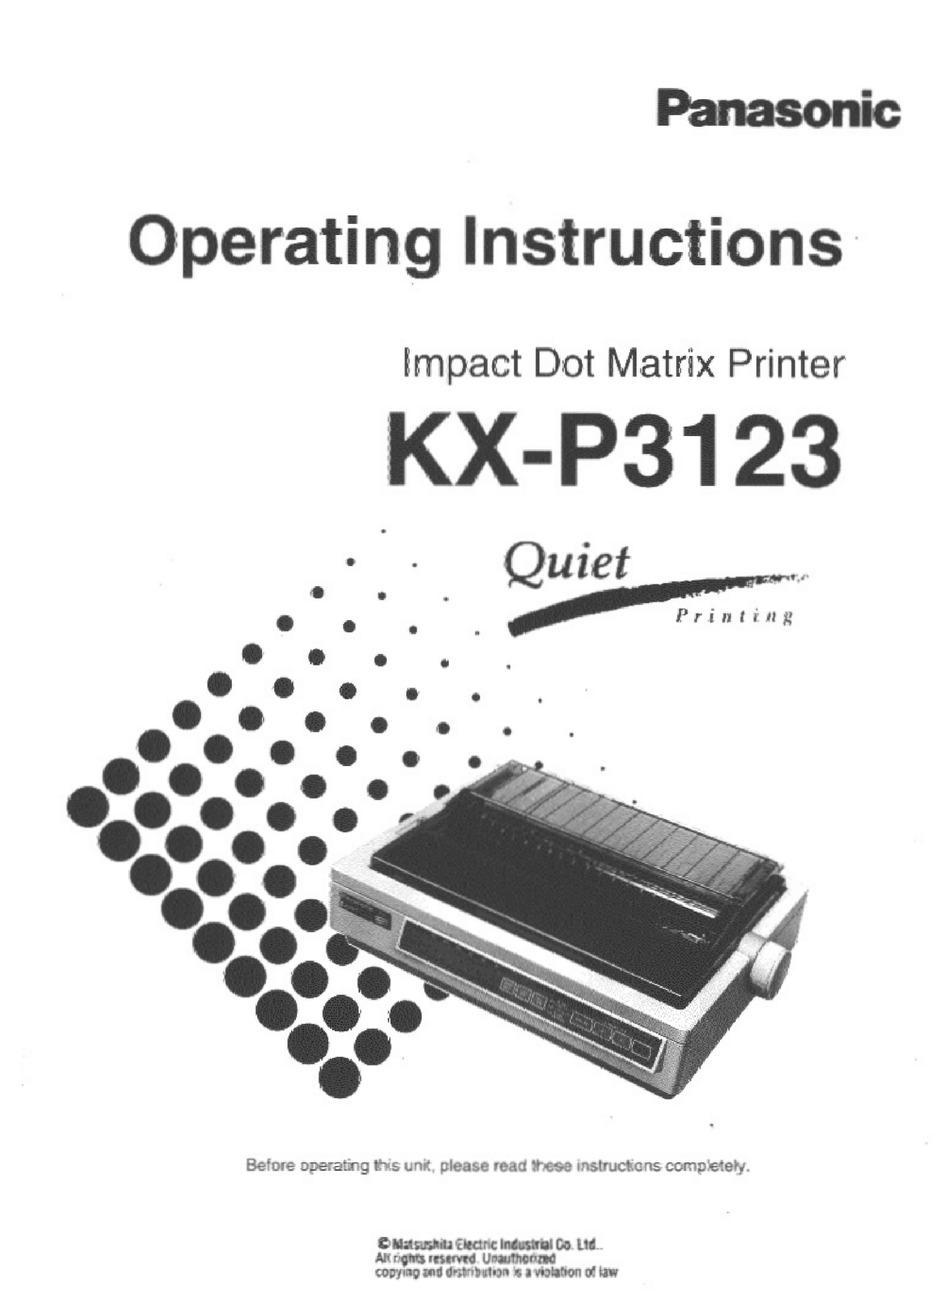 PANASONIC KX-P3123 OPERATING INSTRUCTIONS MANUAL Pdf